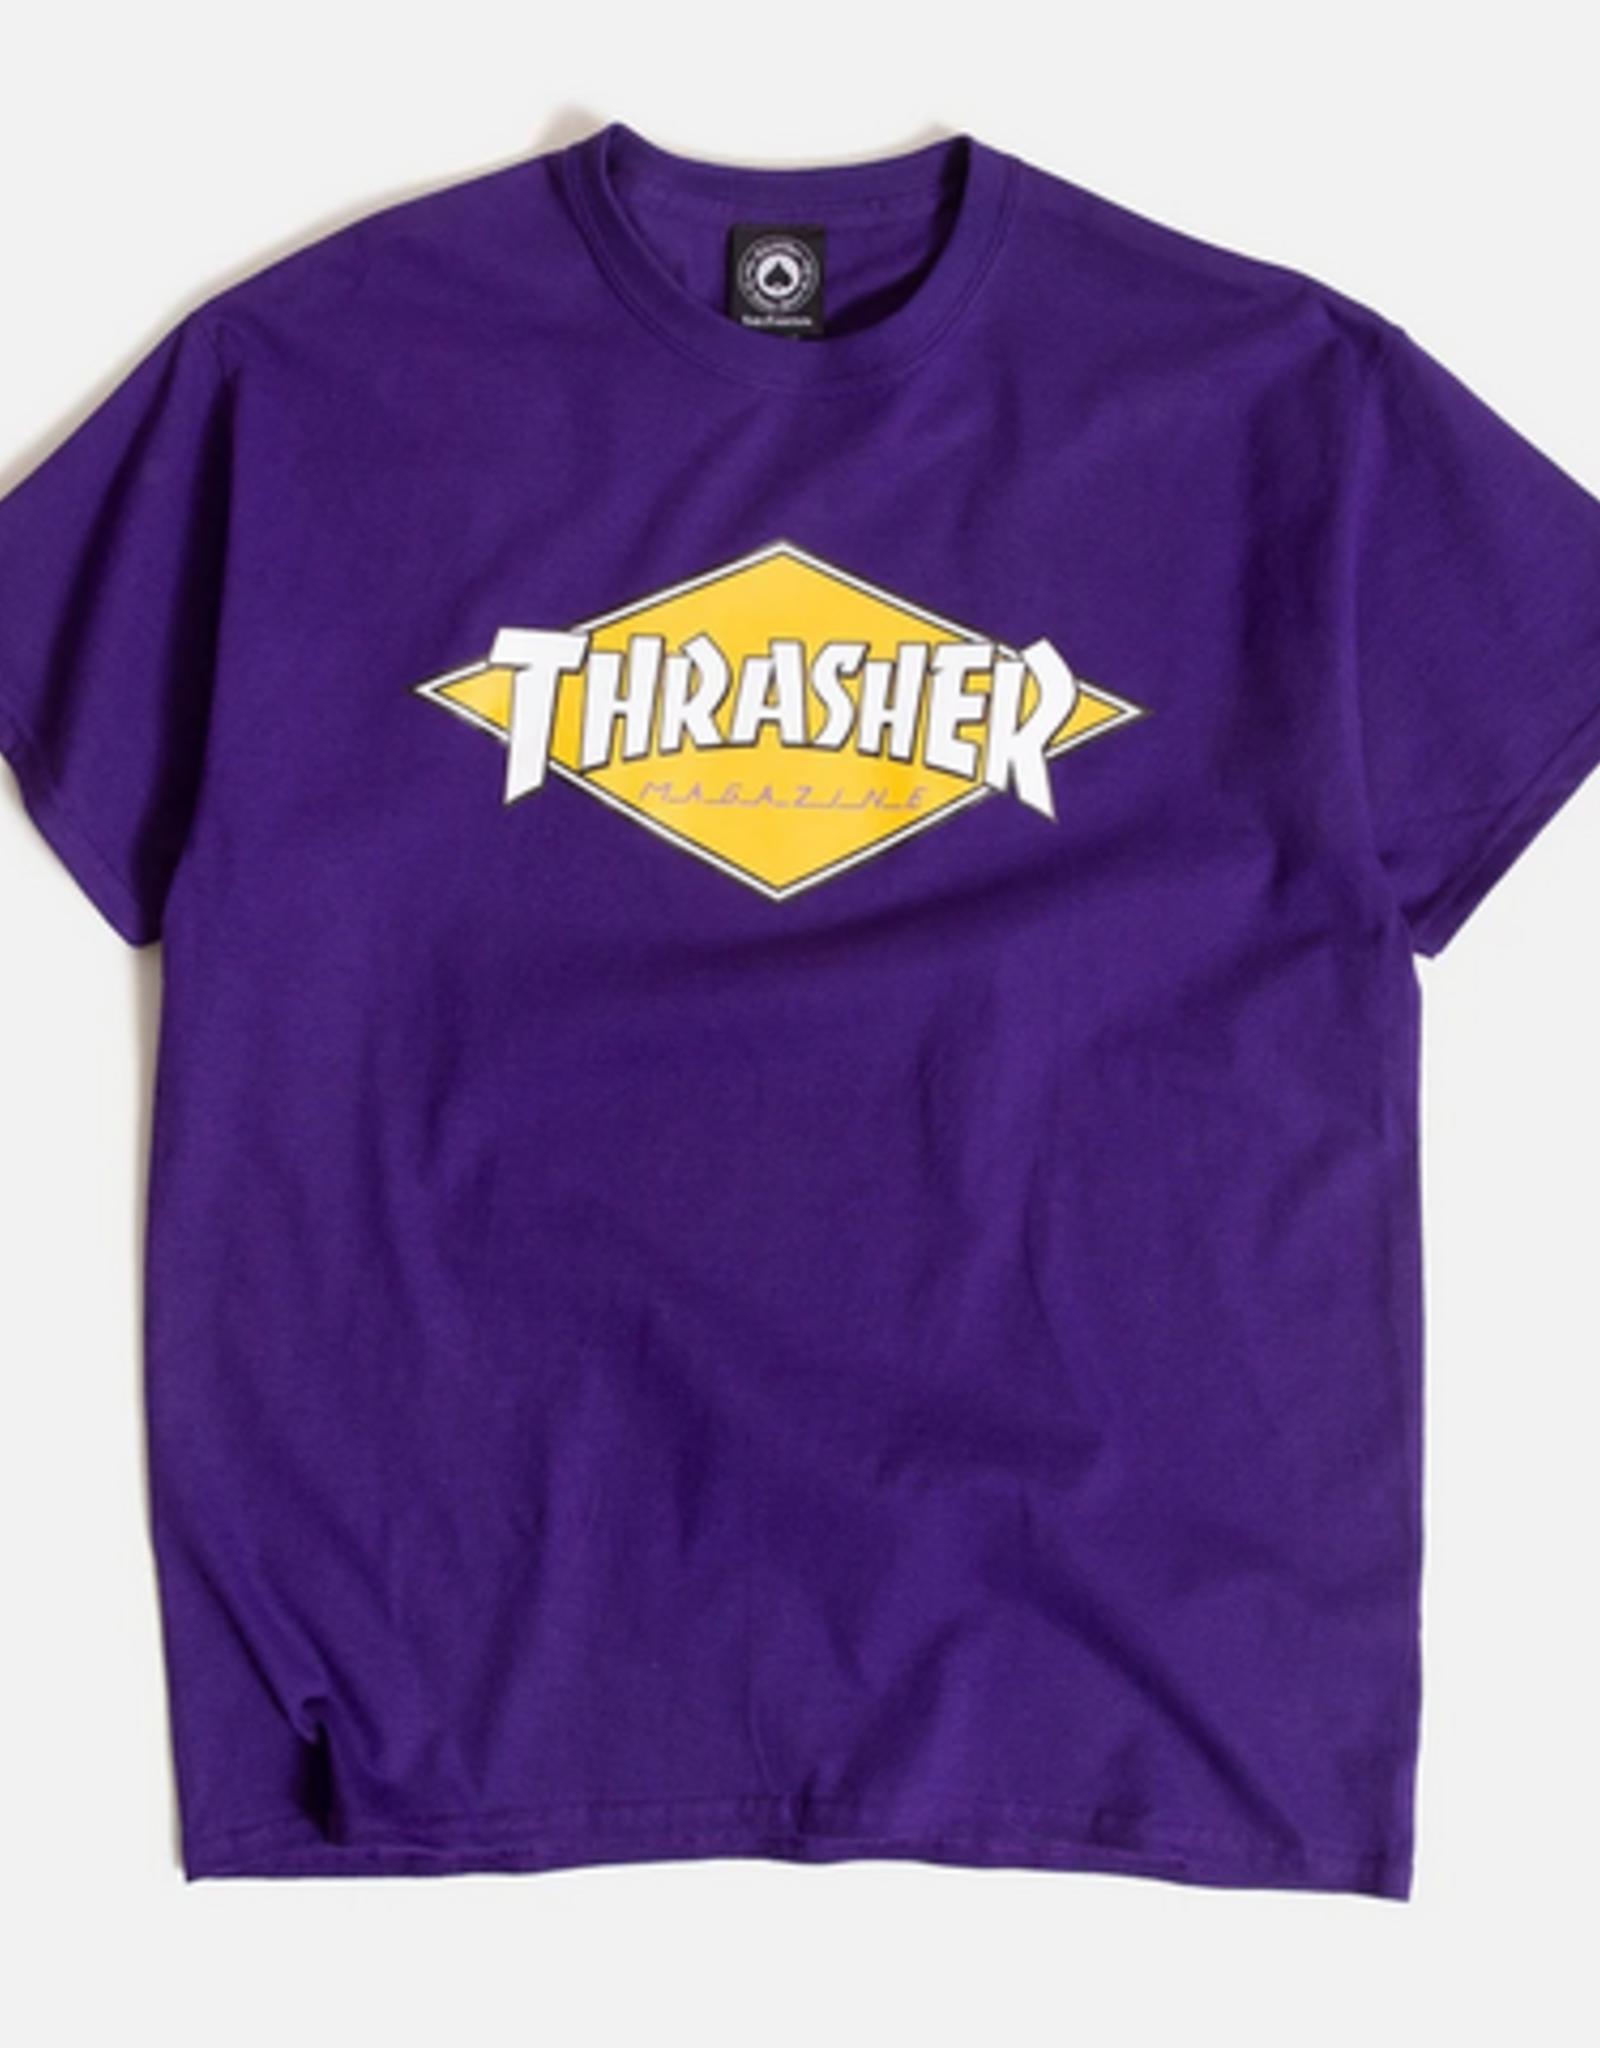 THRASHER THRASHER DIAMOND SS TEE SHIRT